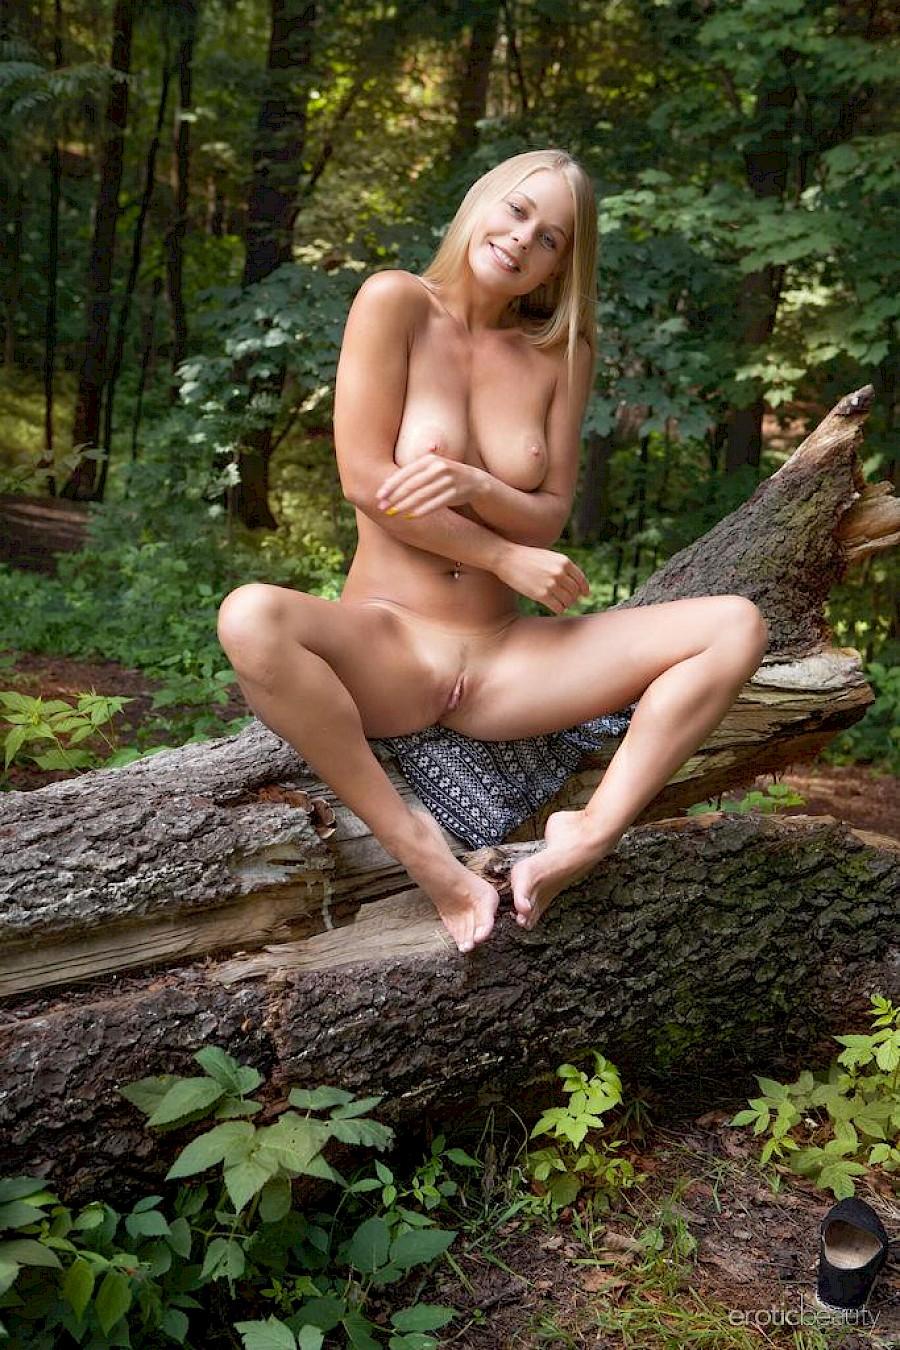 Hot tits galleries richtig